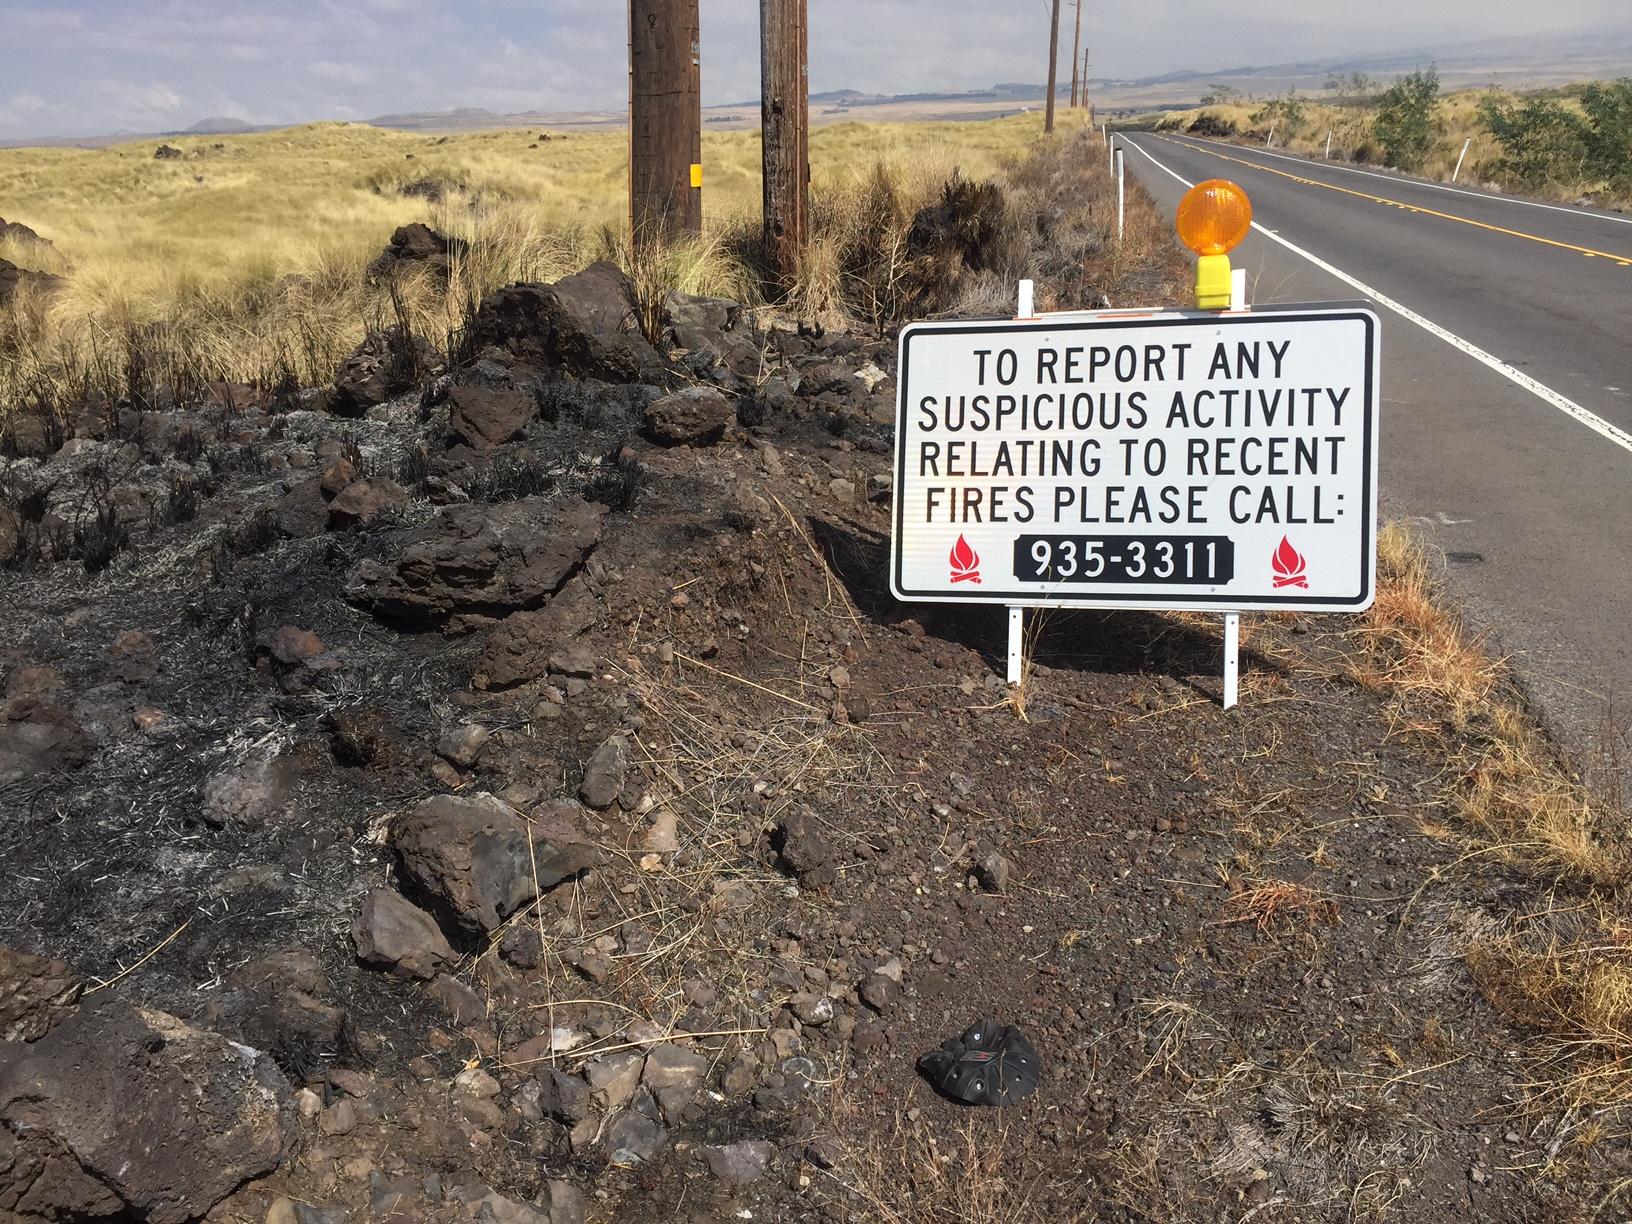 suspicious brush fires sign dlnr_146336